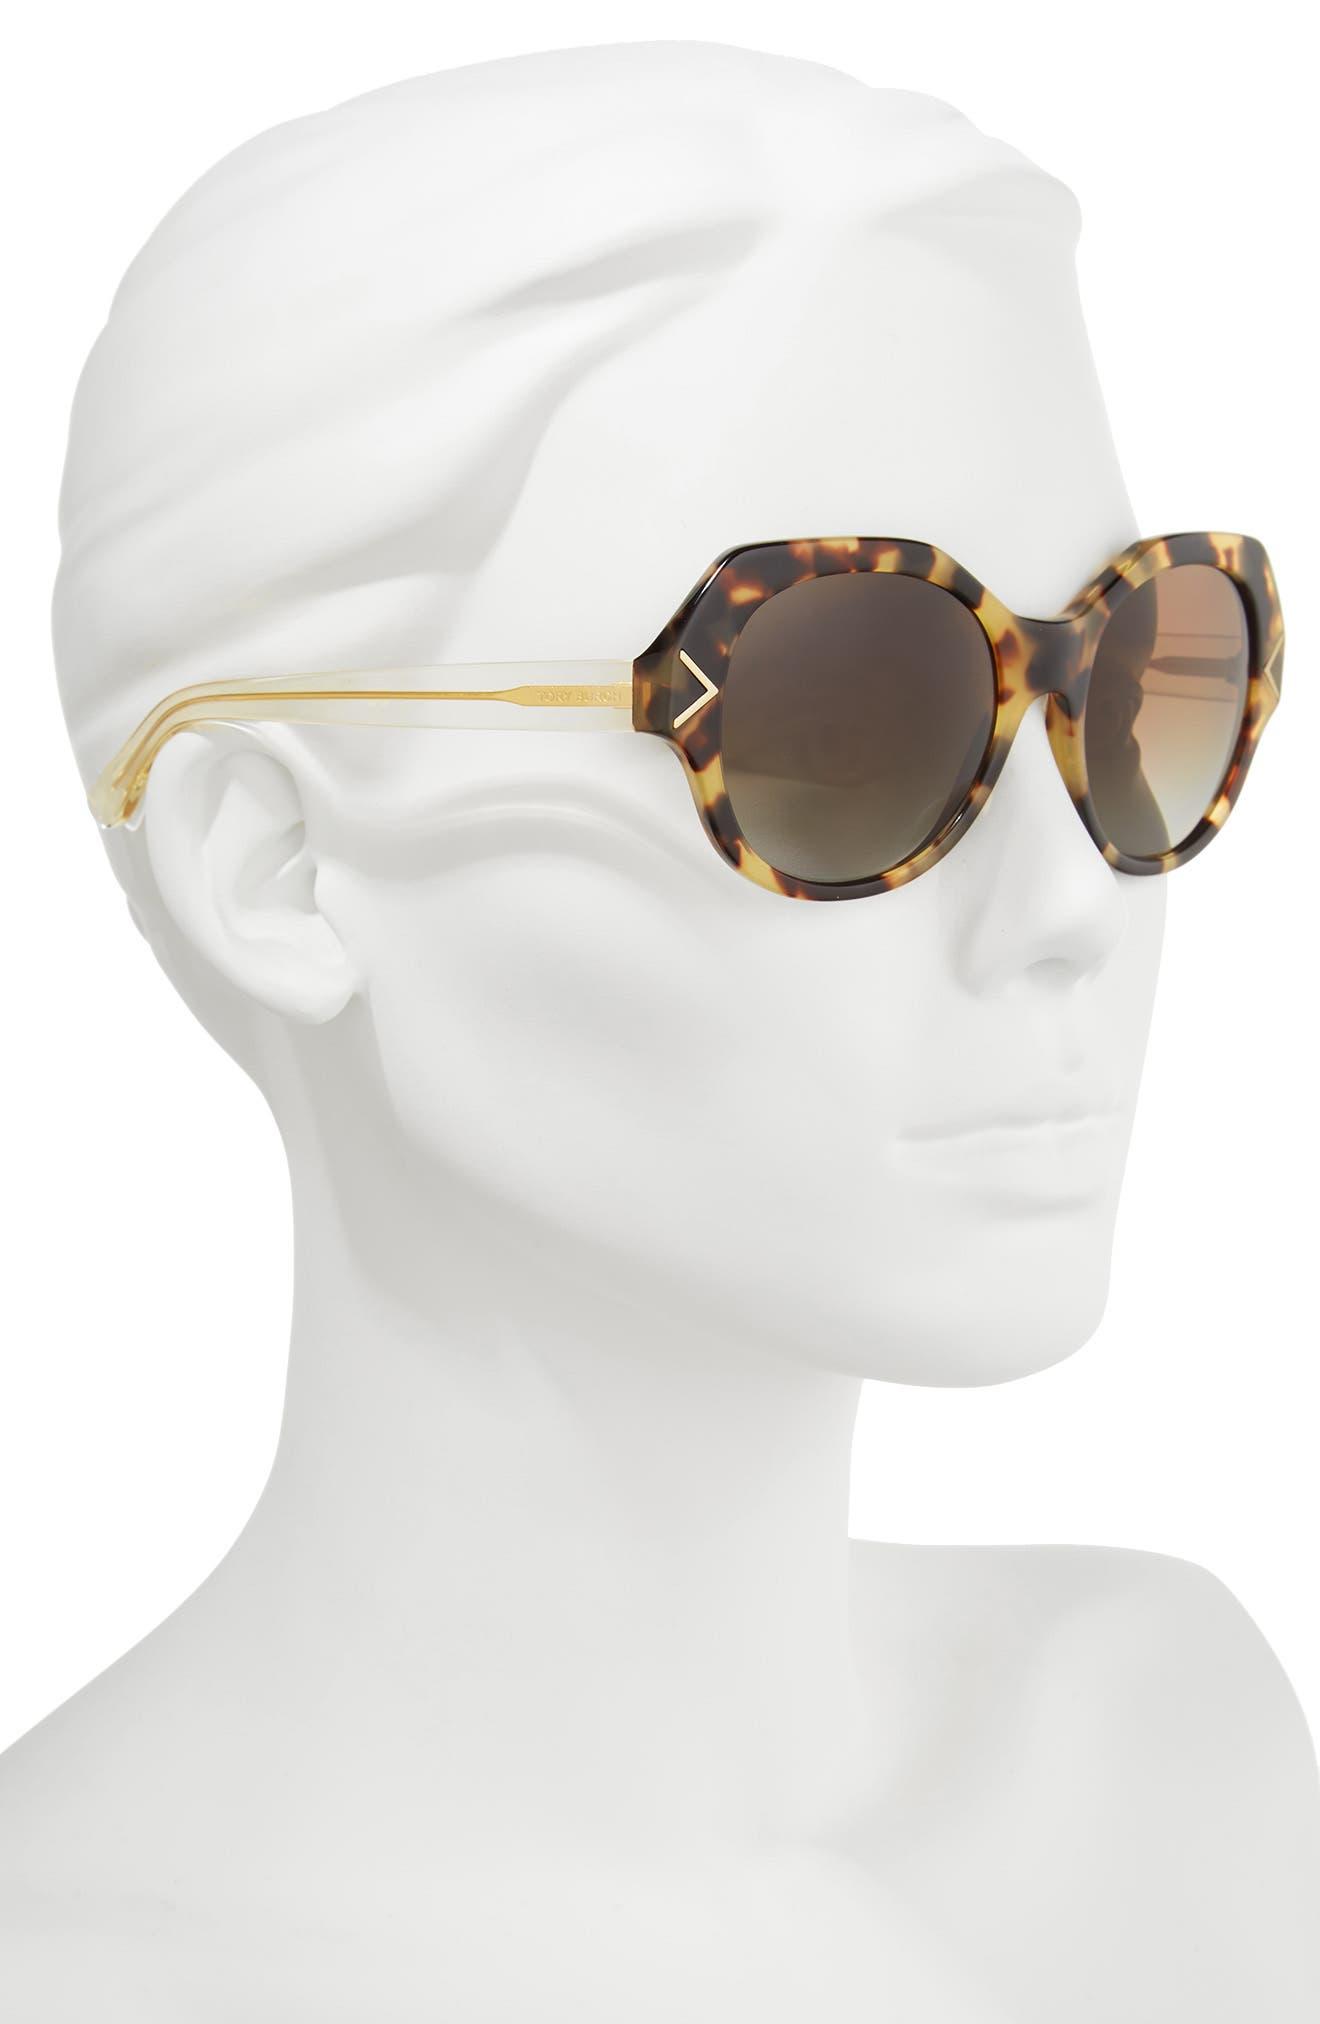 53mm Polarized Gradient Geometric Sunglasses,                             Alternate thumbnail 4, color,